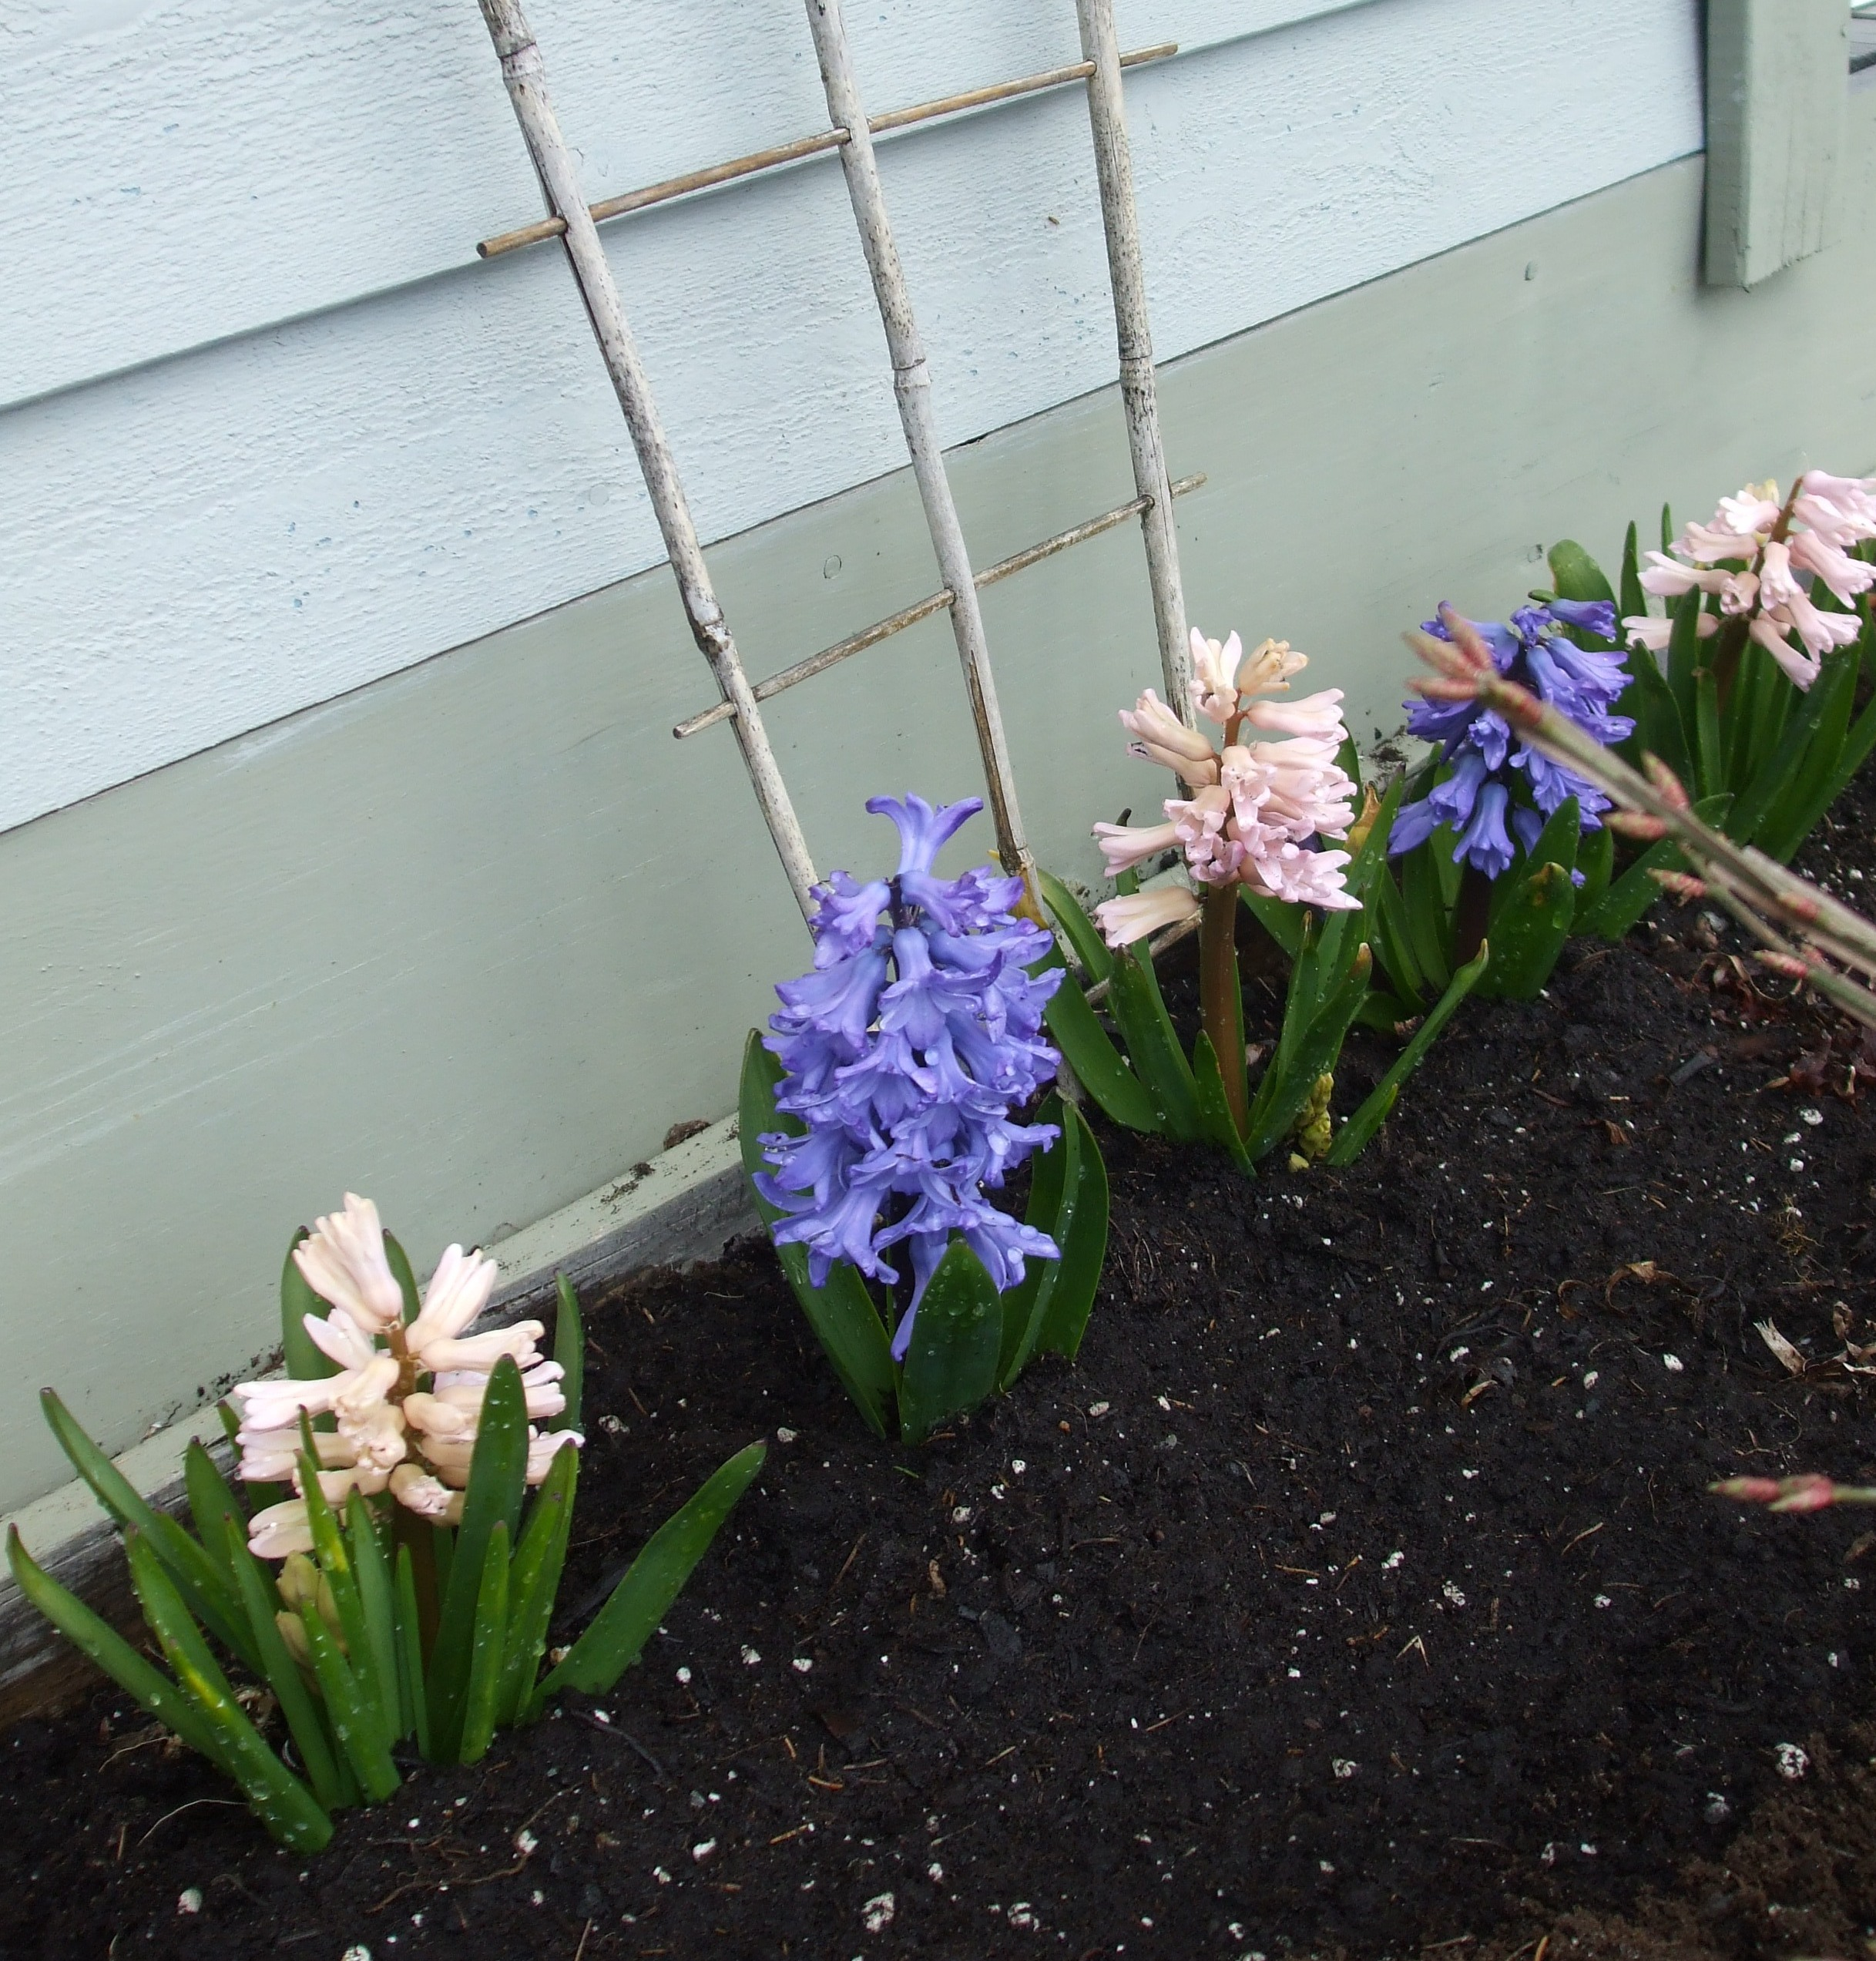 Jocelyn's hyacinths